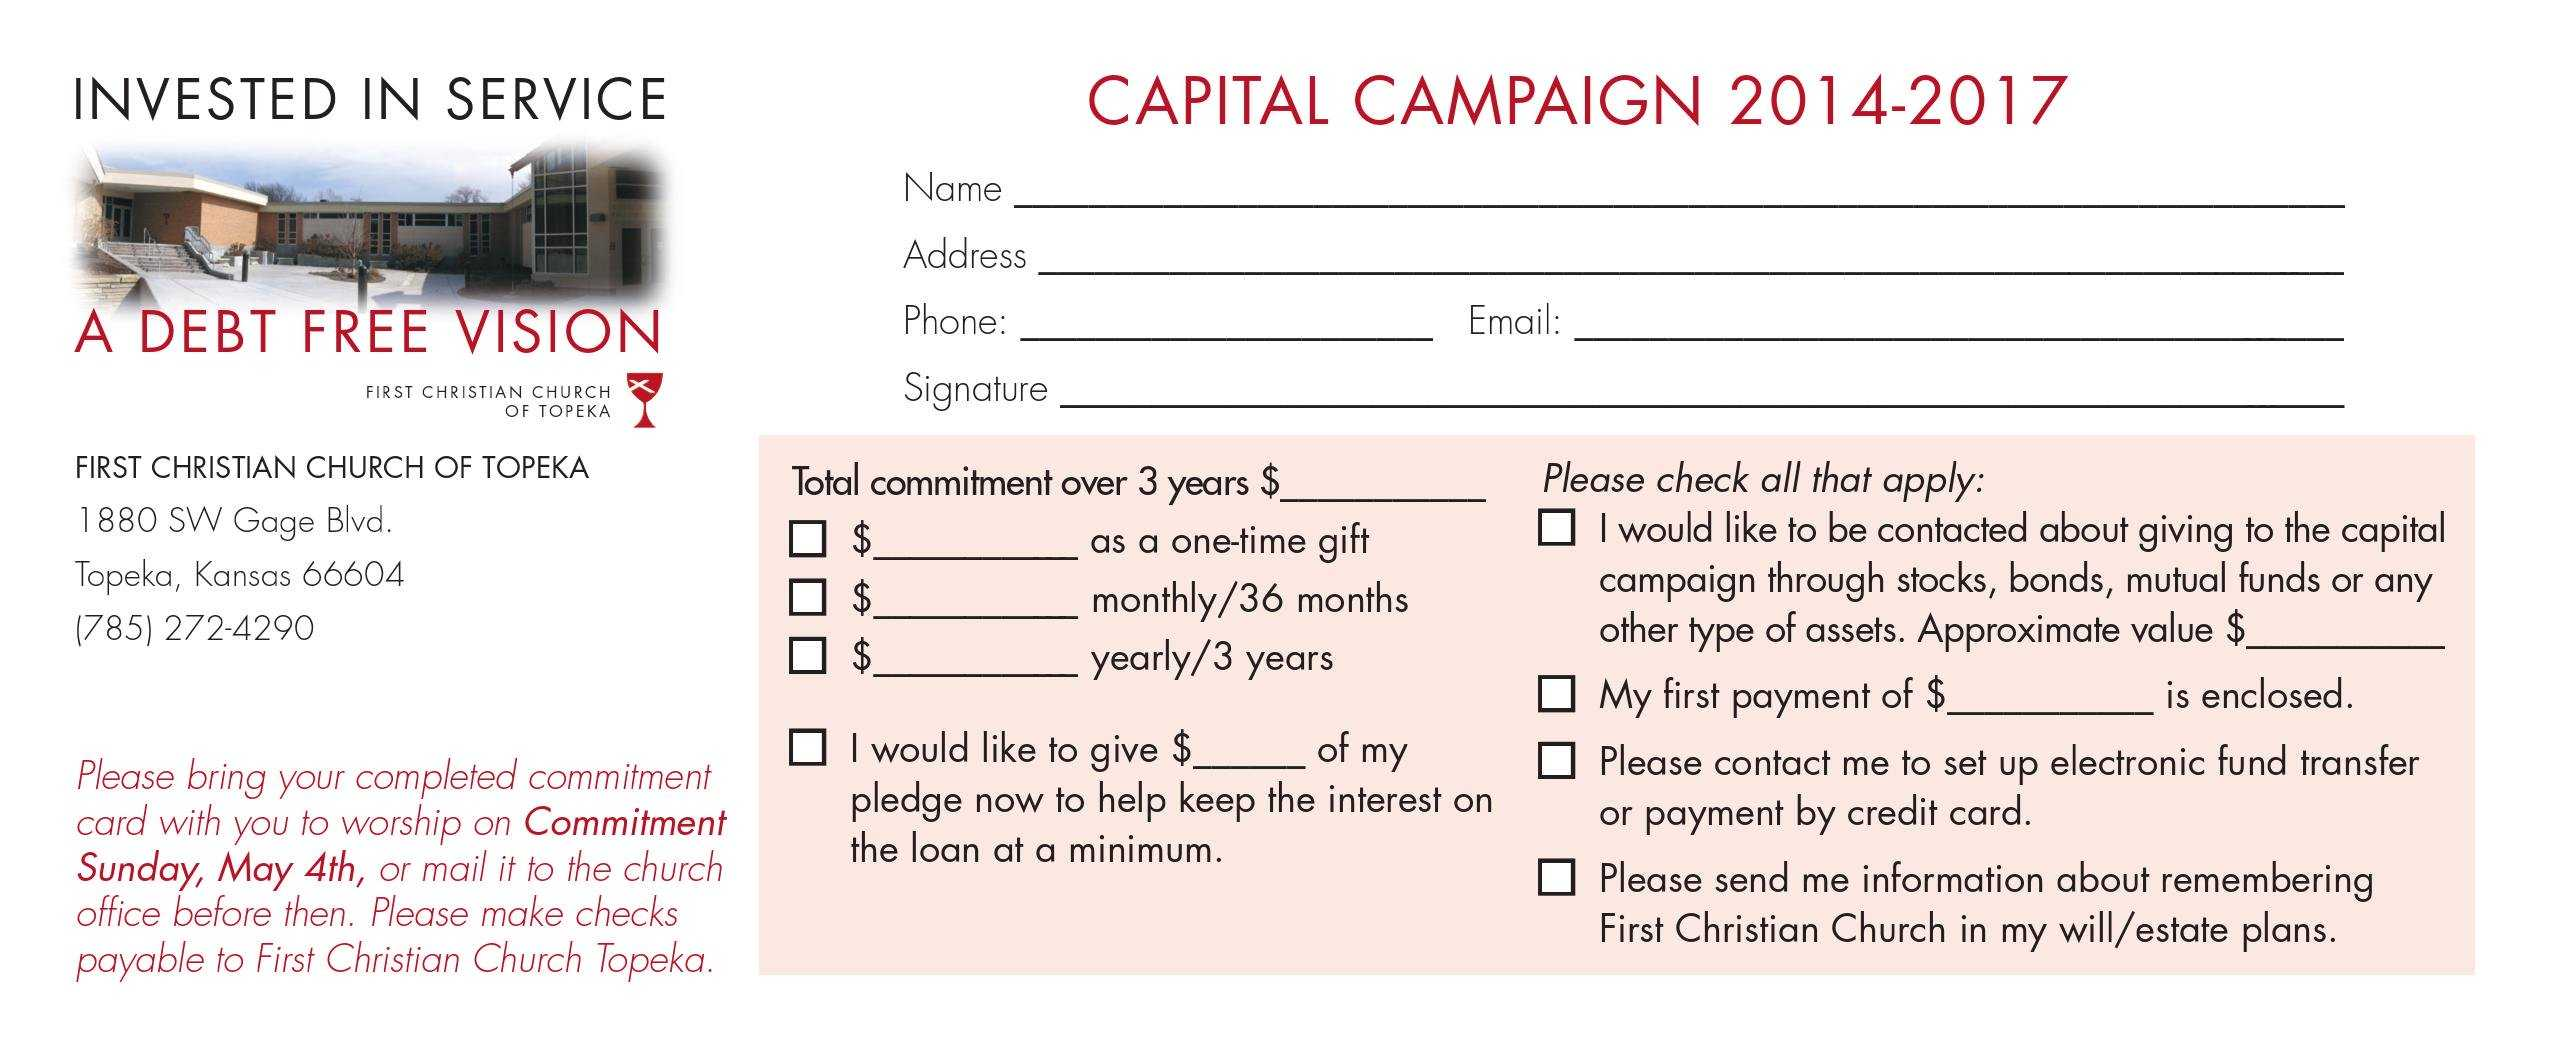 Church Capital Campaign Pledge Card Samples With Free Pledge Card Template